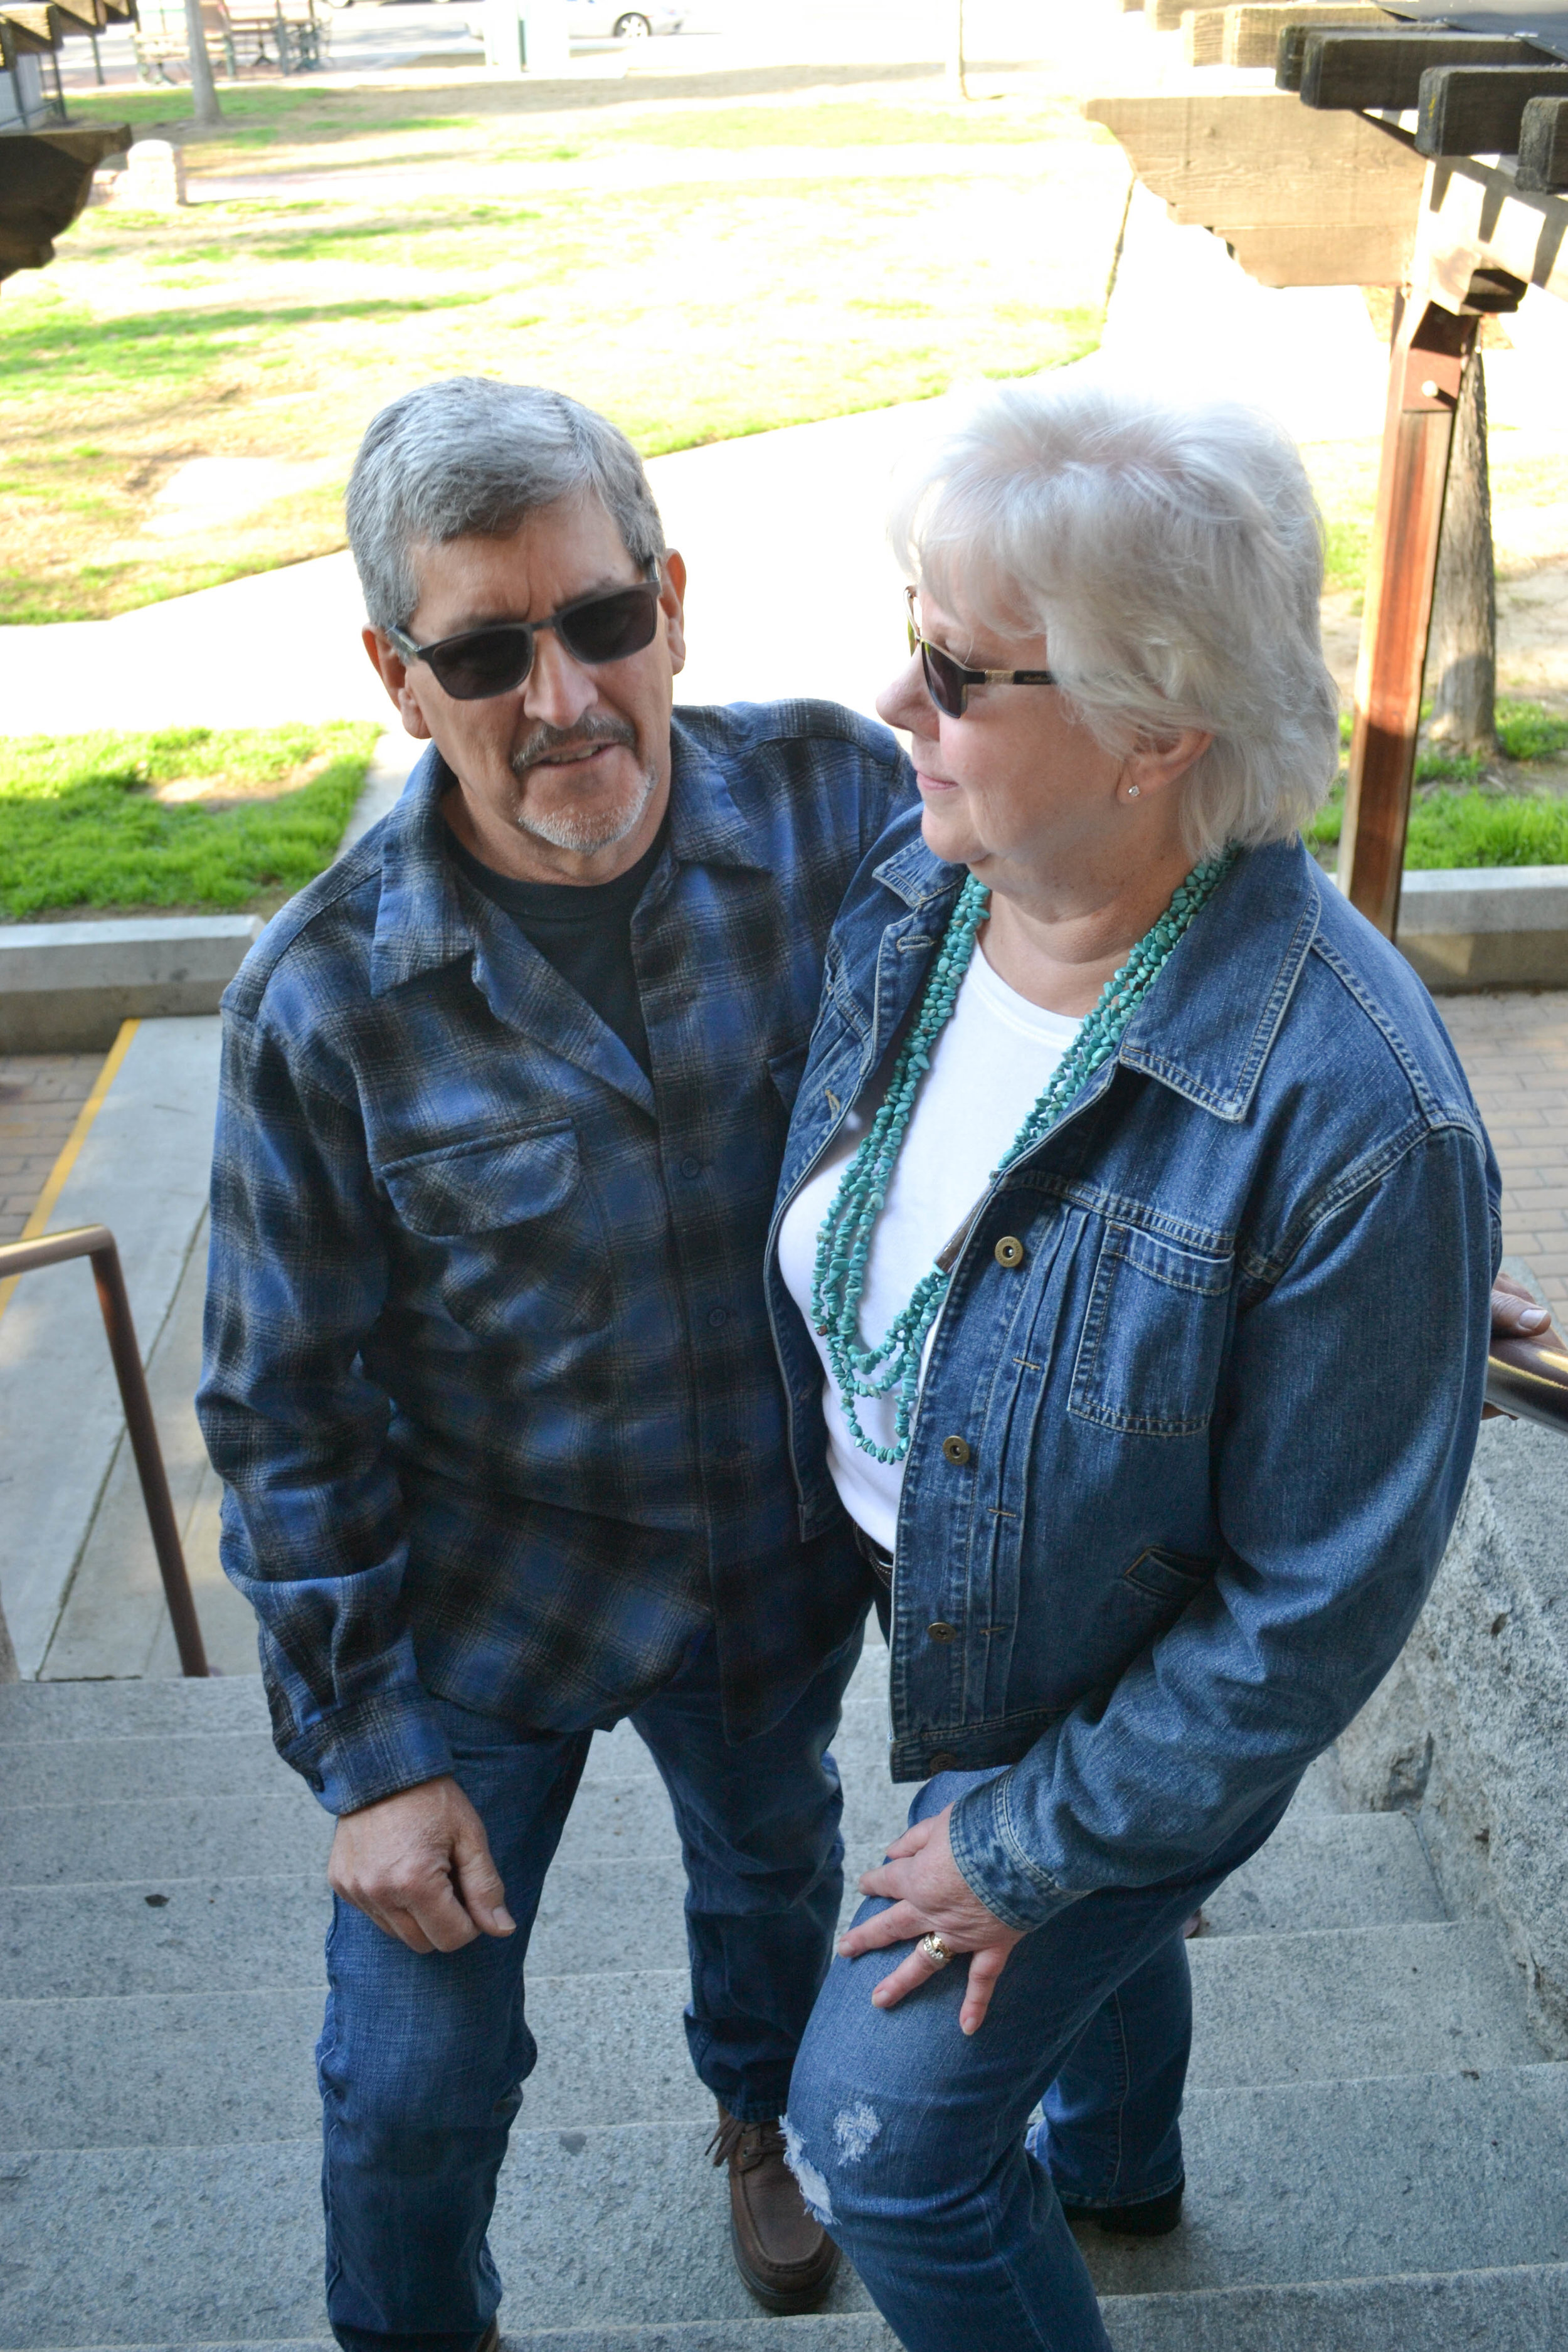 bri rinehart; photographer; hanford; couple